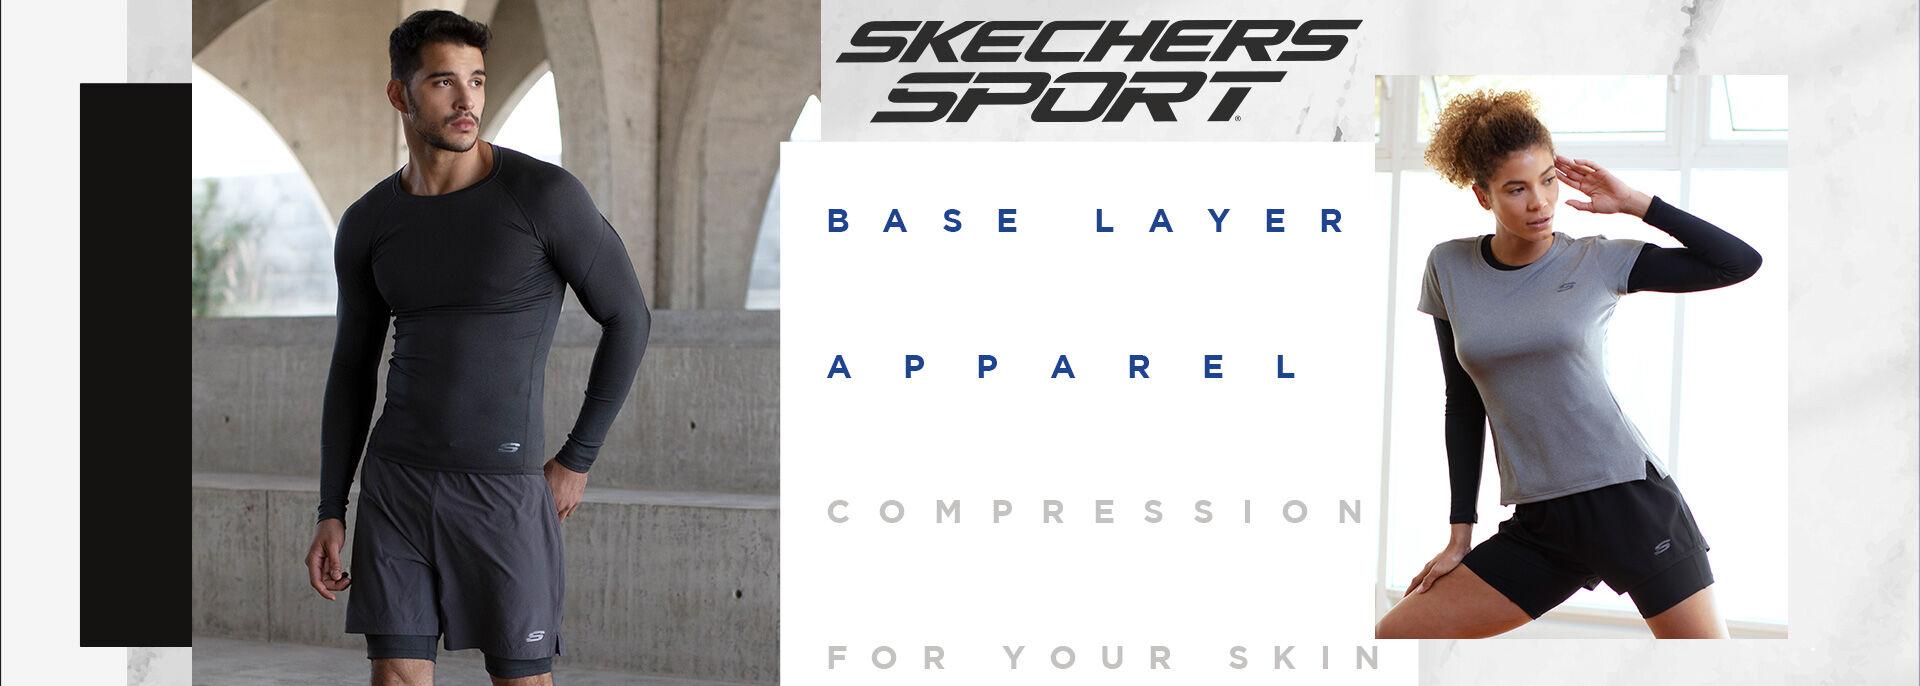 base_layer_skechers_1920x686.jpg